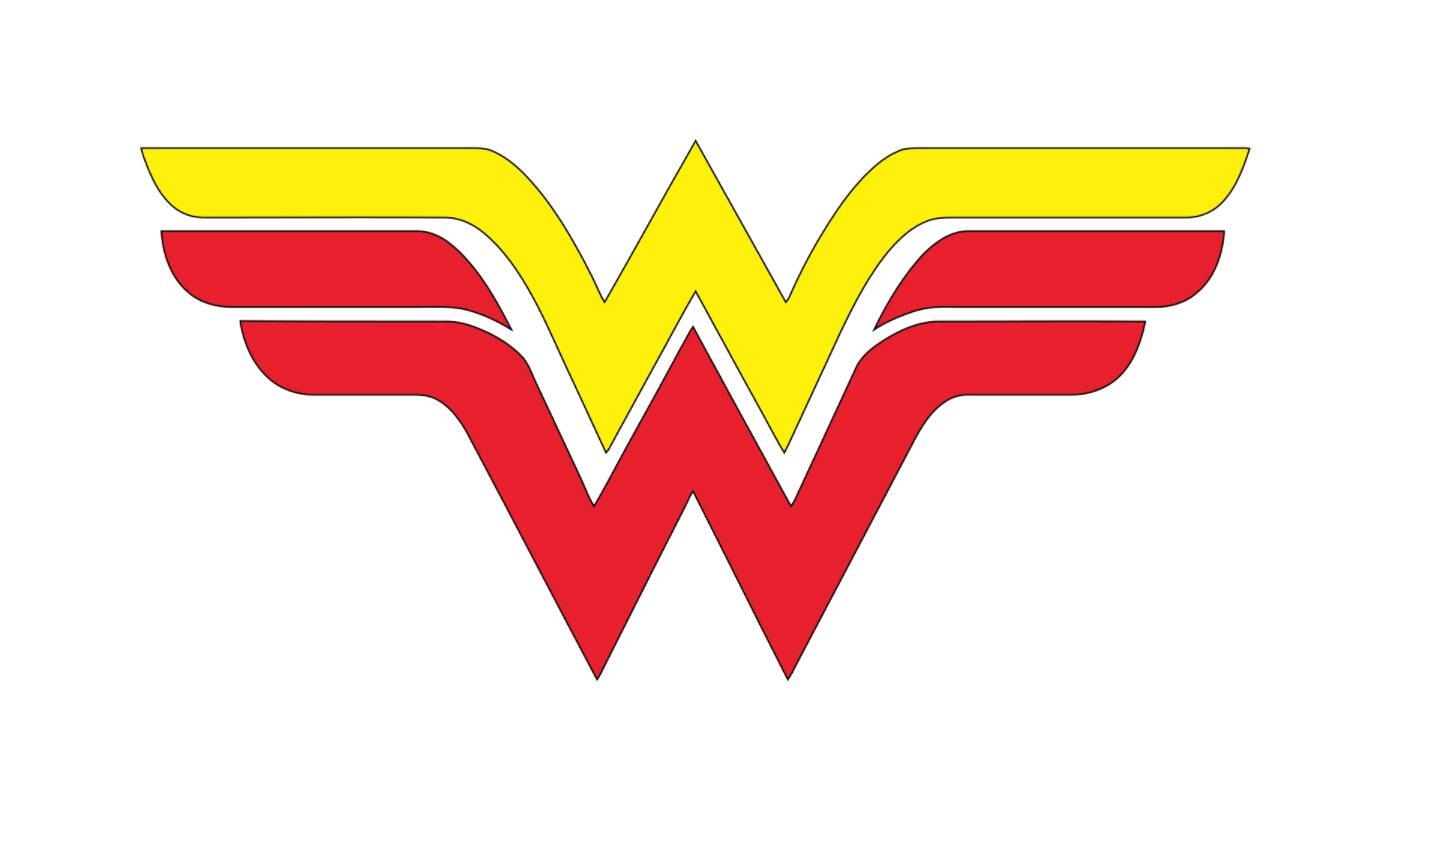 Wonder Woman Iron On Vinyl Decal, Heat Transfer Vinyl